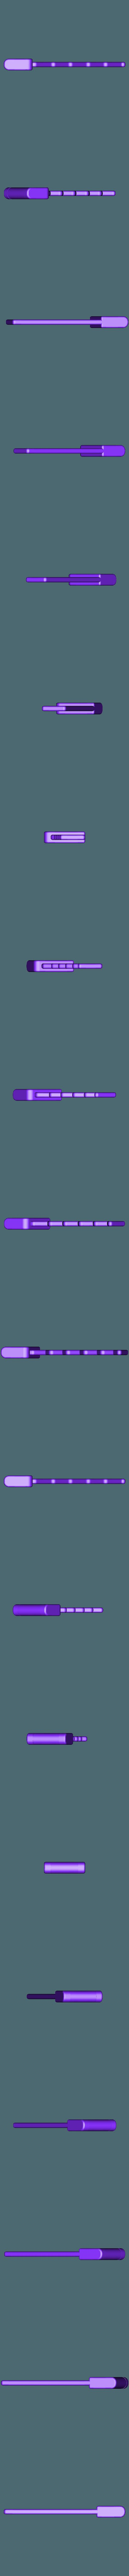 playmobil_saw.stl Download free STL file Playmobil toolbox with tools • 3D printable template, sokinkeso